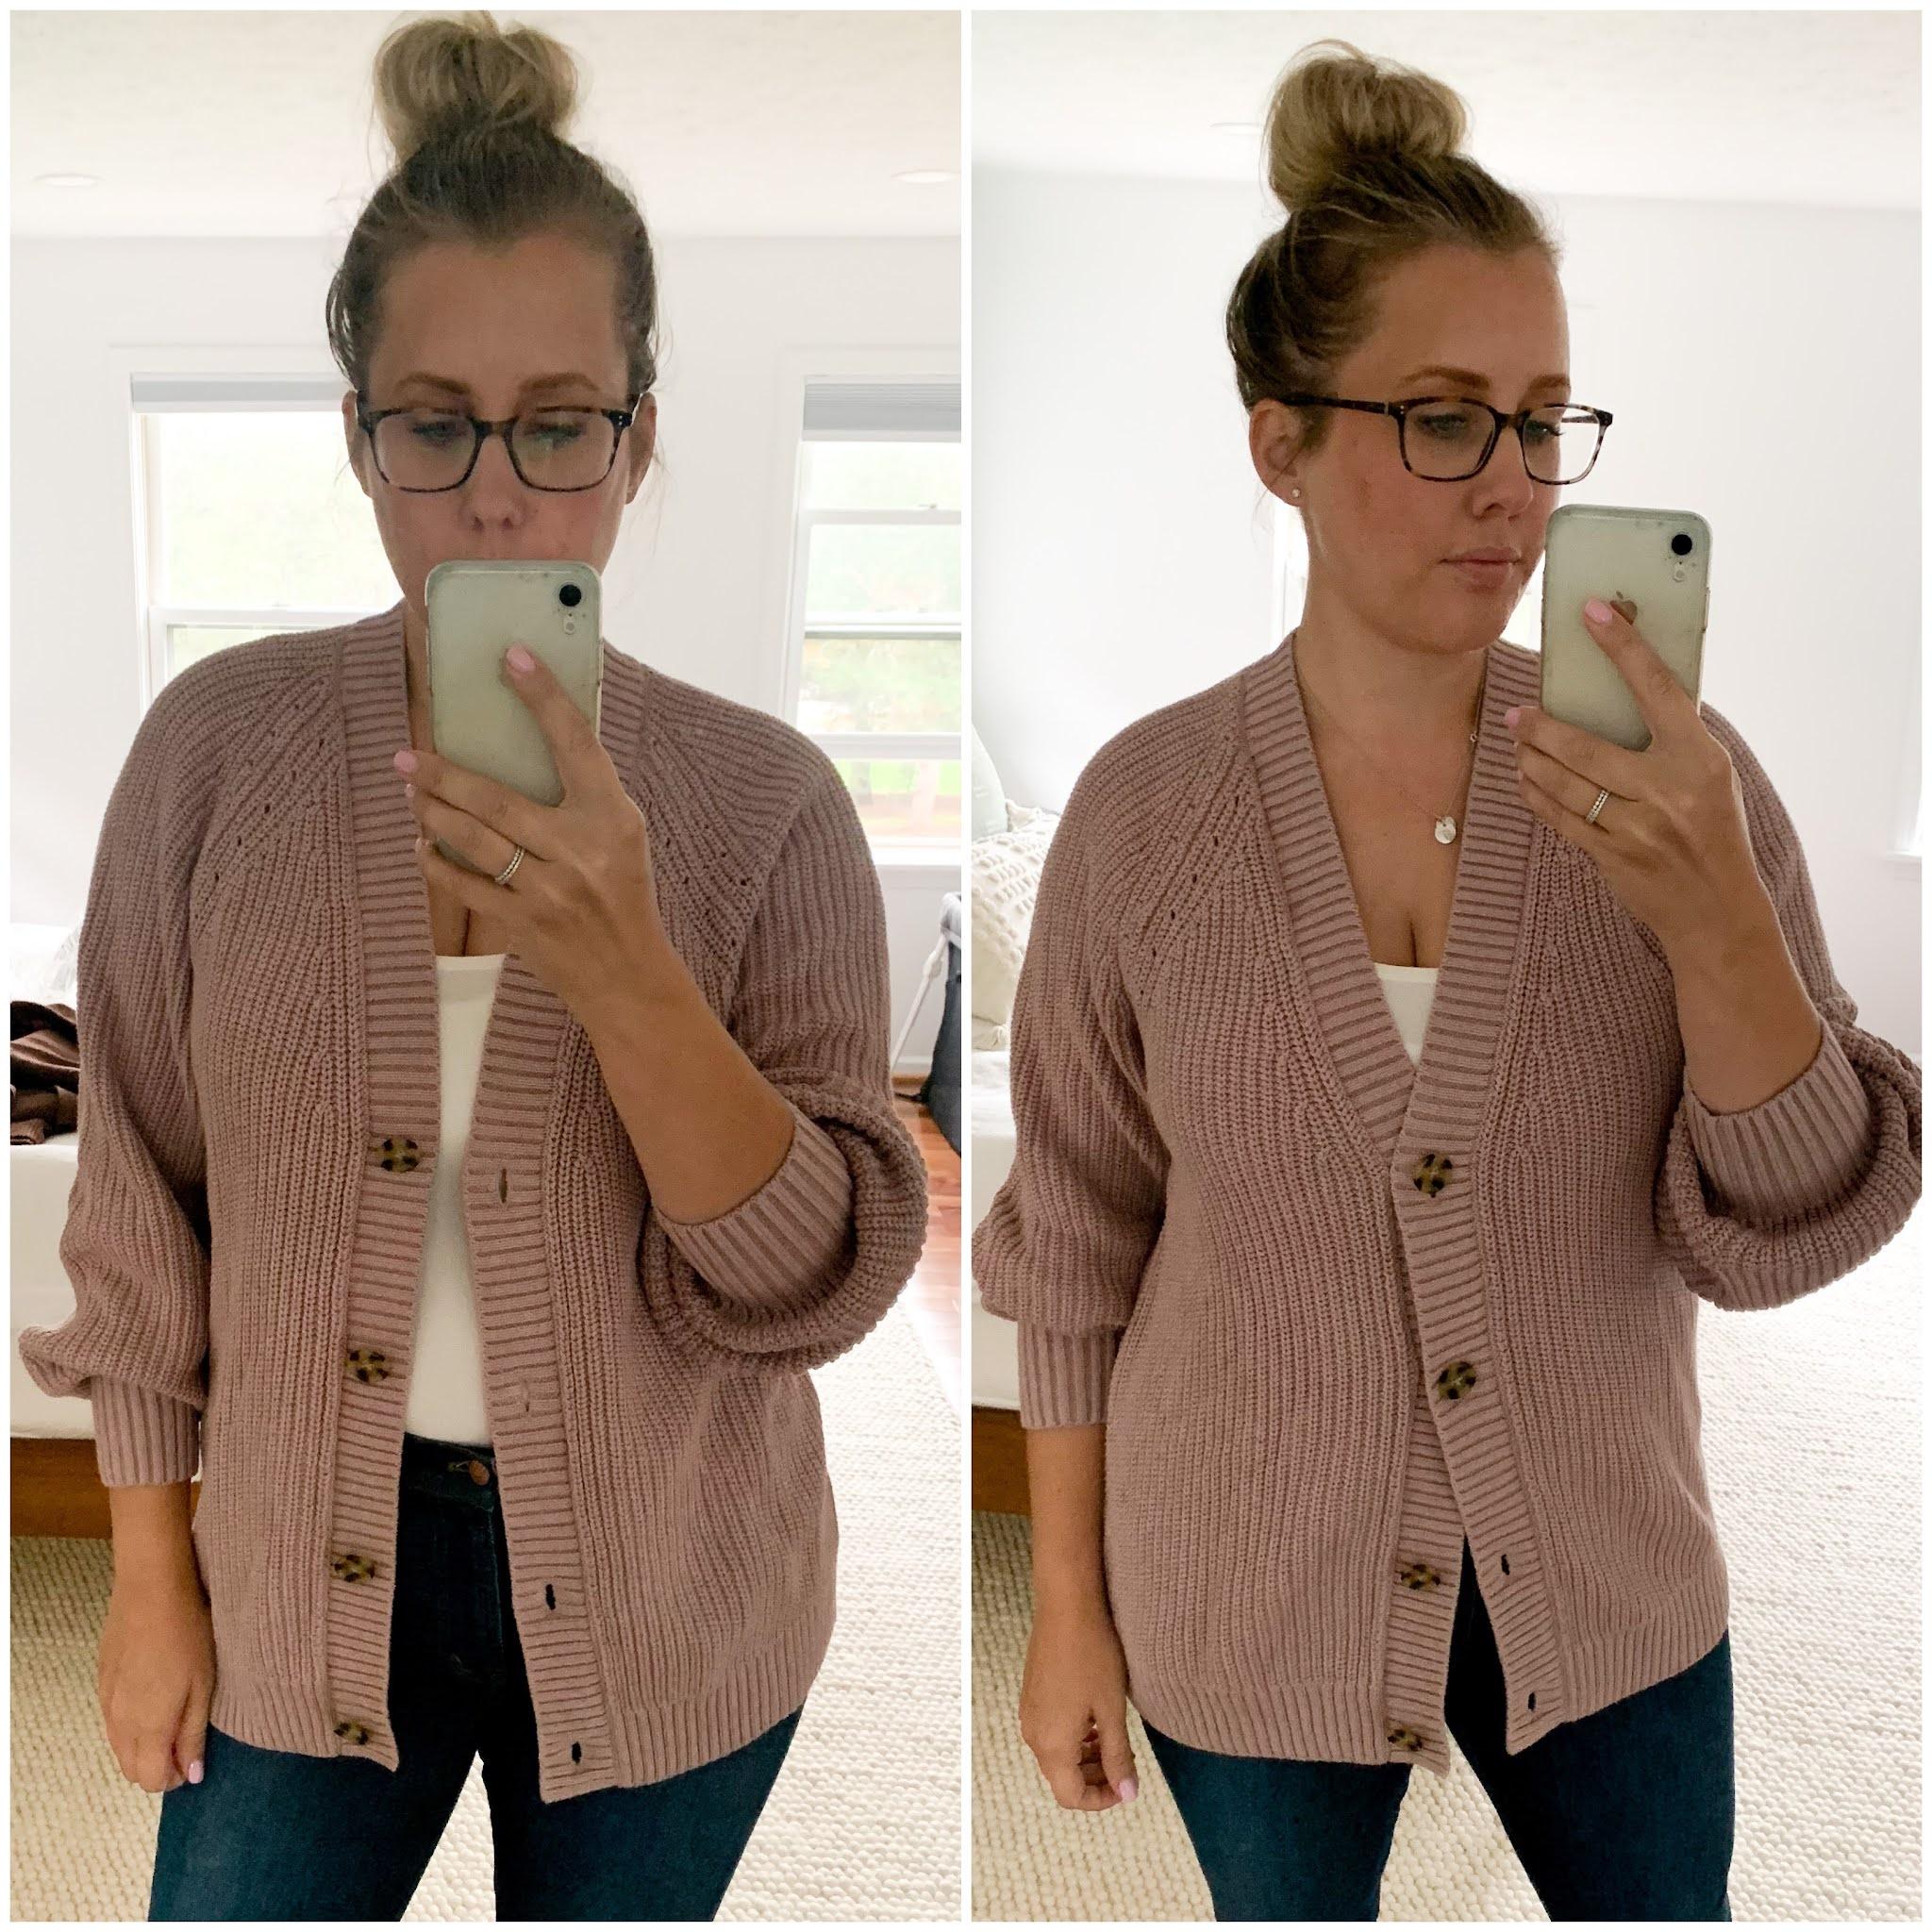 gap boyfriend shaker-stitch cotton cardigan